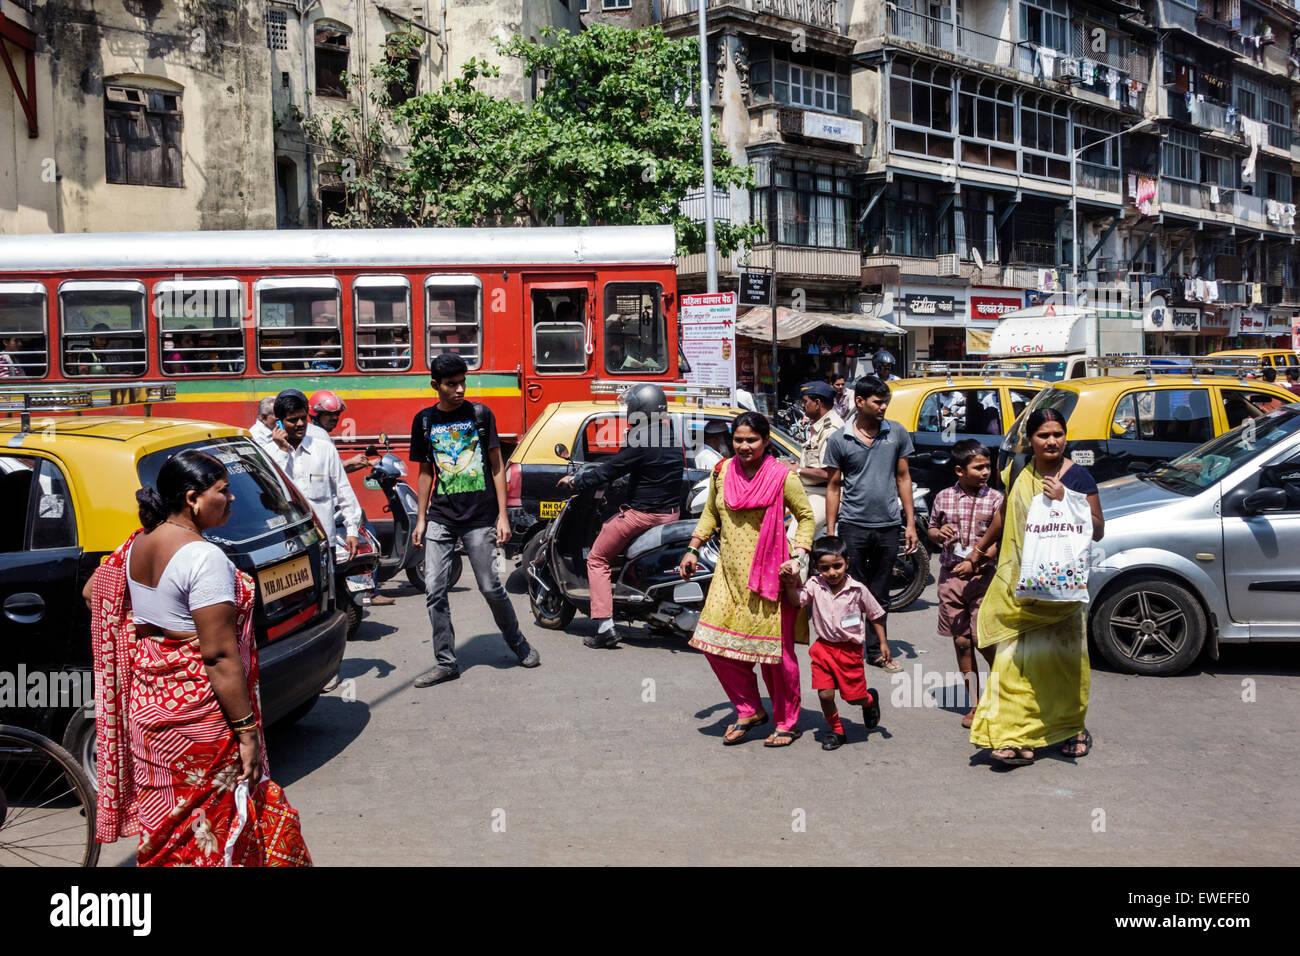 Mumbai India Indian Asian Tardeo Jehangir Boman Behram Road traffic older slum apartments BEST bus motorcycle motor - Stock Image